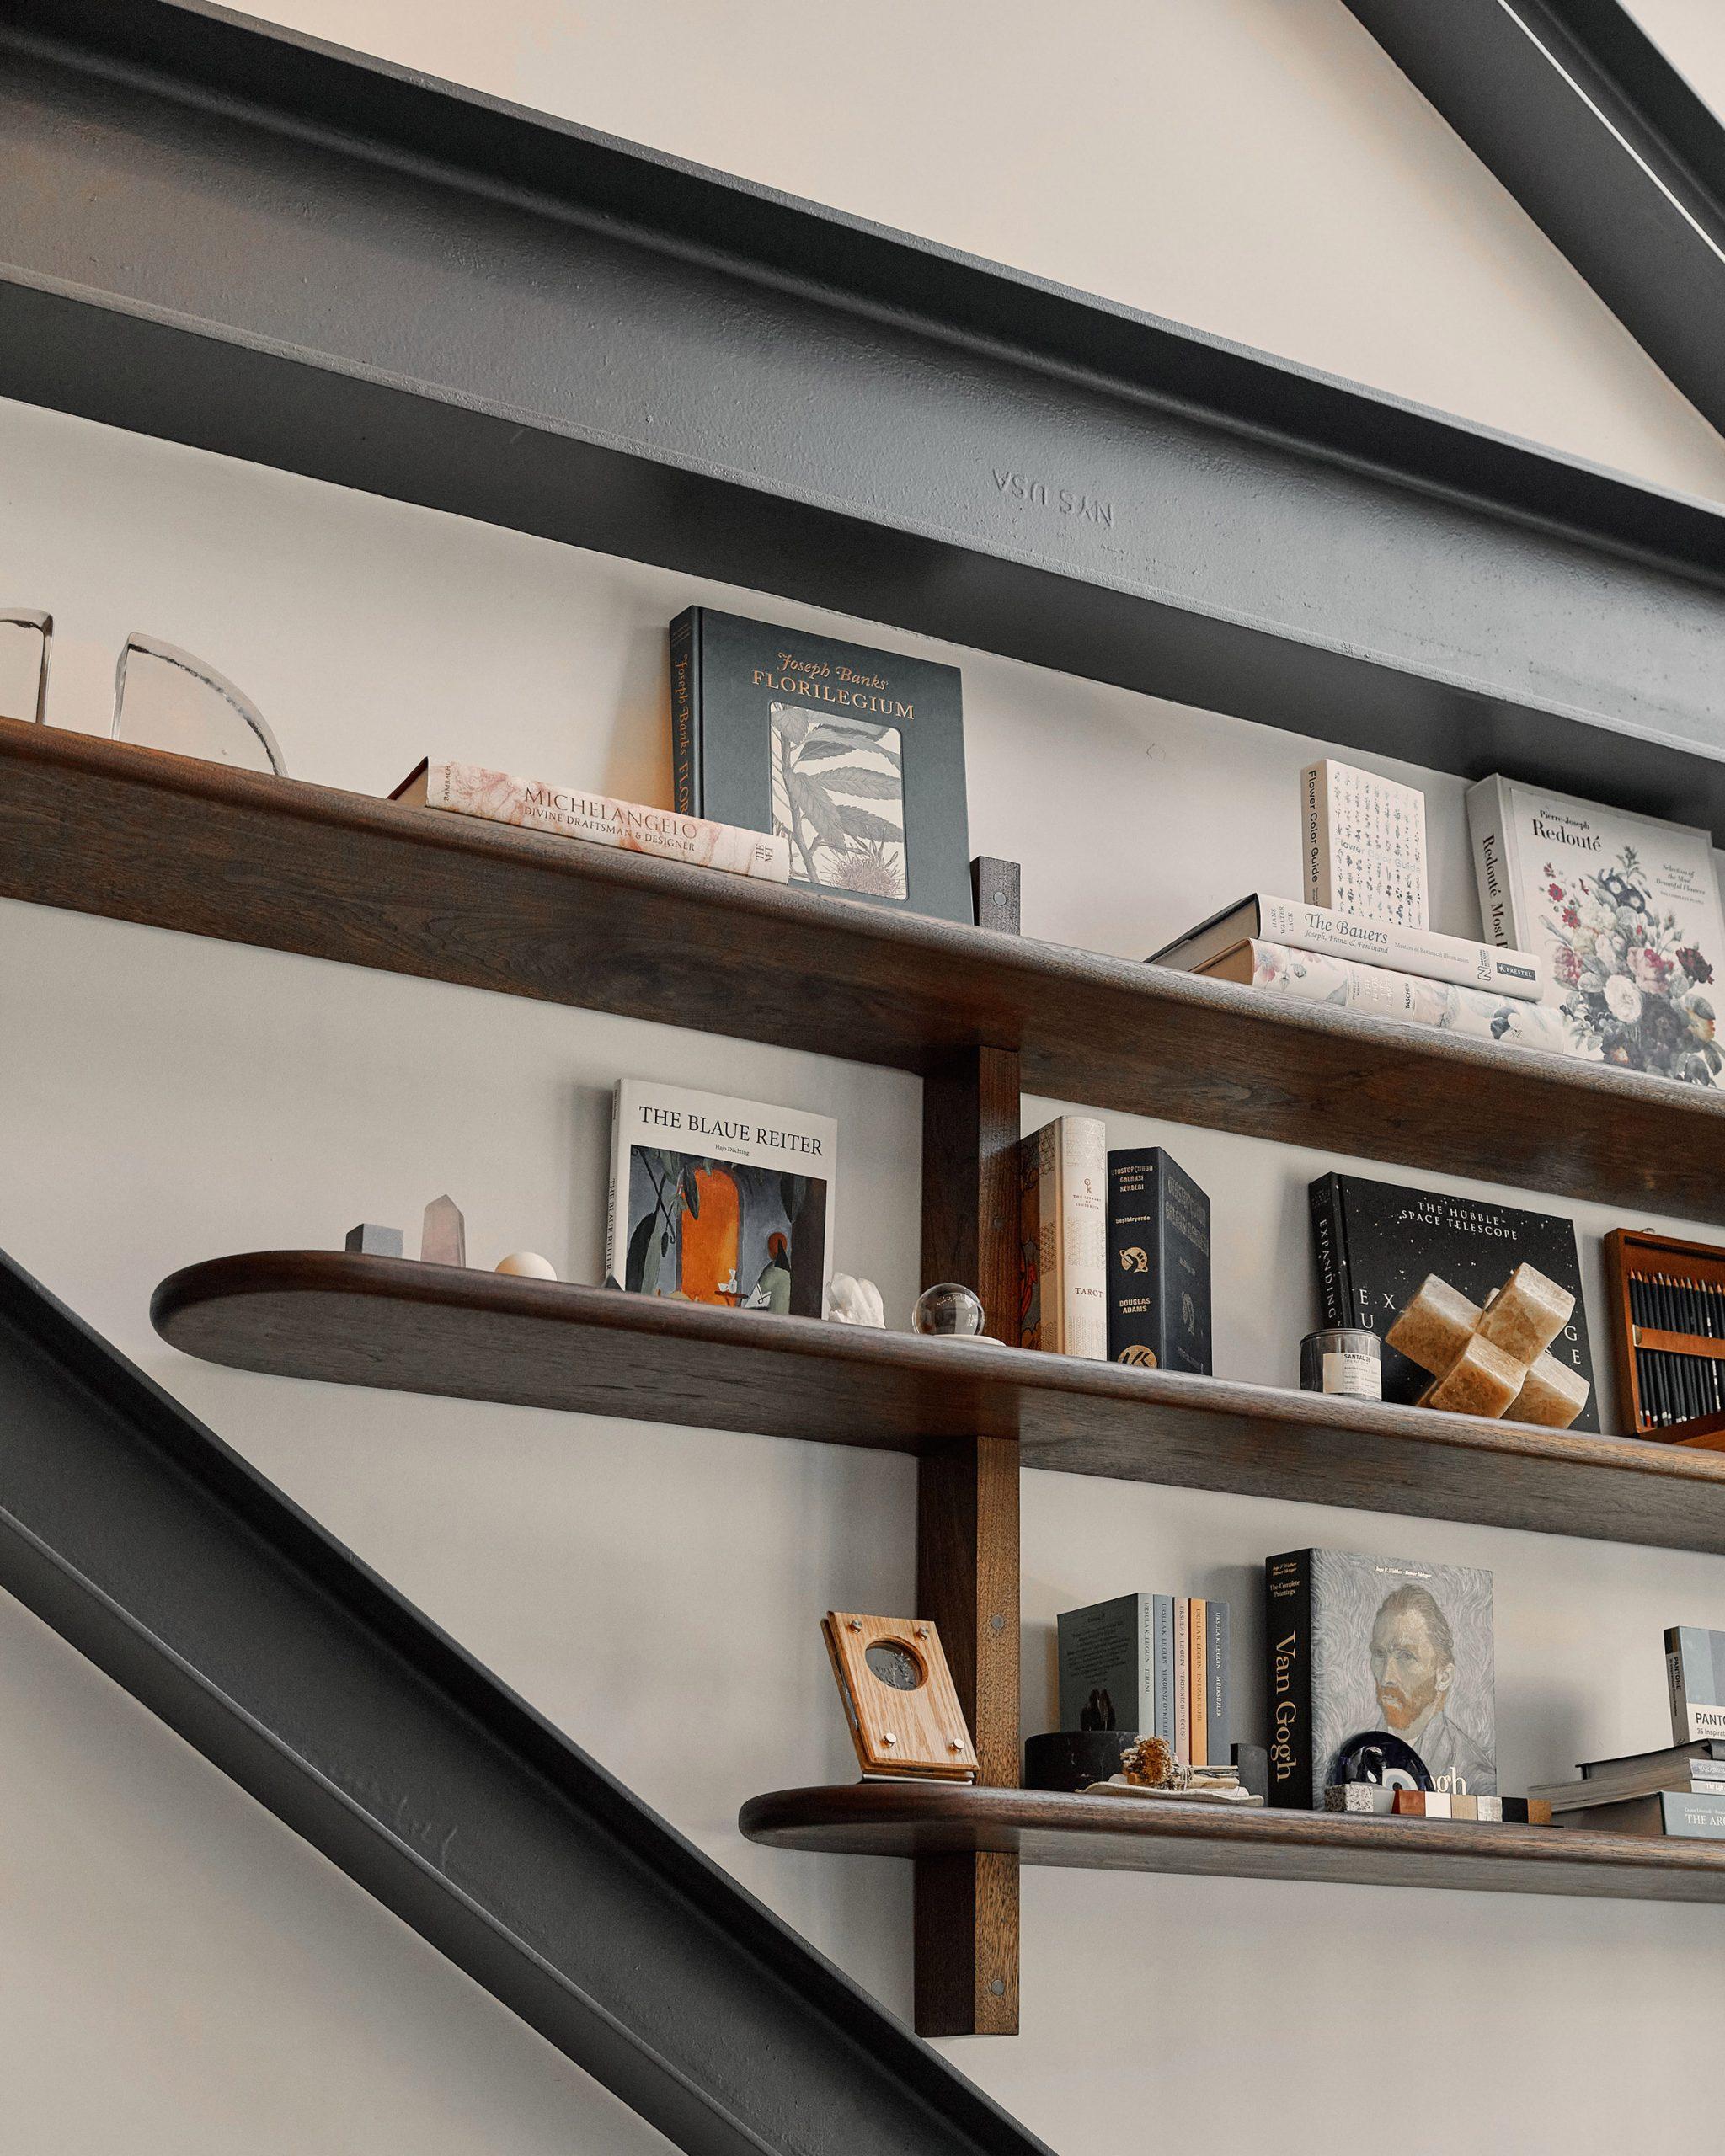 Bookshelves by Joseph Cauvel in Williamsburg tattoo parlour